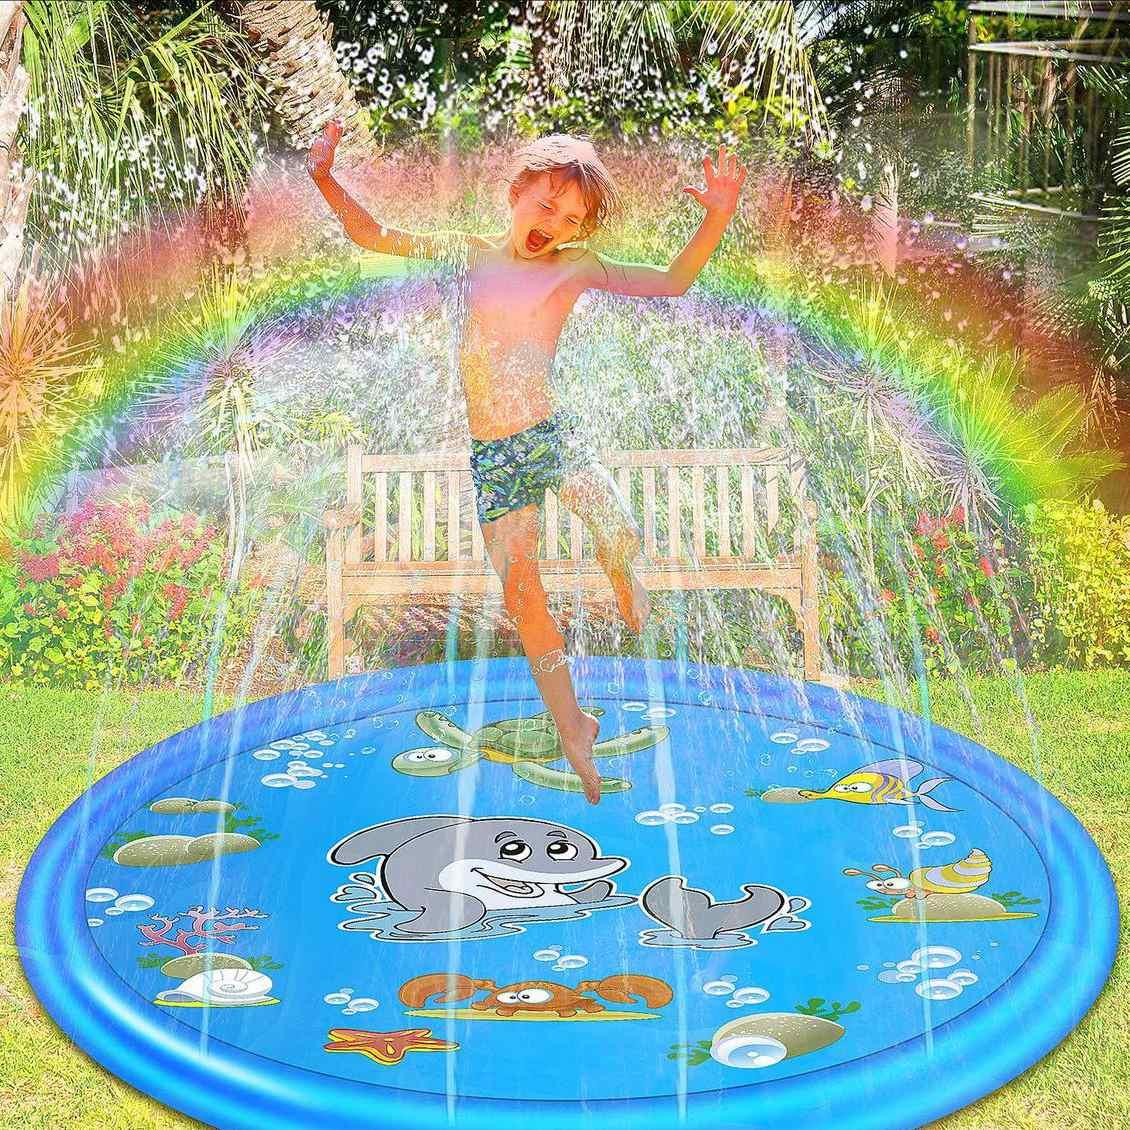 172cm Round Kid Inflatable Splash Play Pool Mini Spray Swimming Pool Fun Water Playing Sprinkler Mat Yard Outdoor Summer PVC